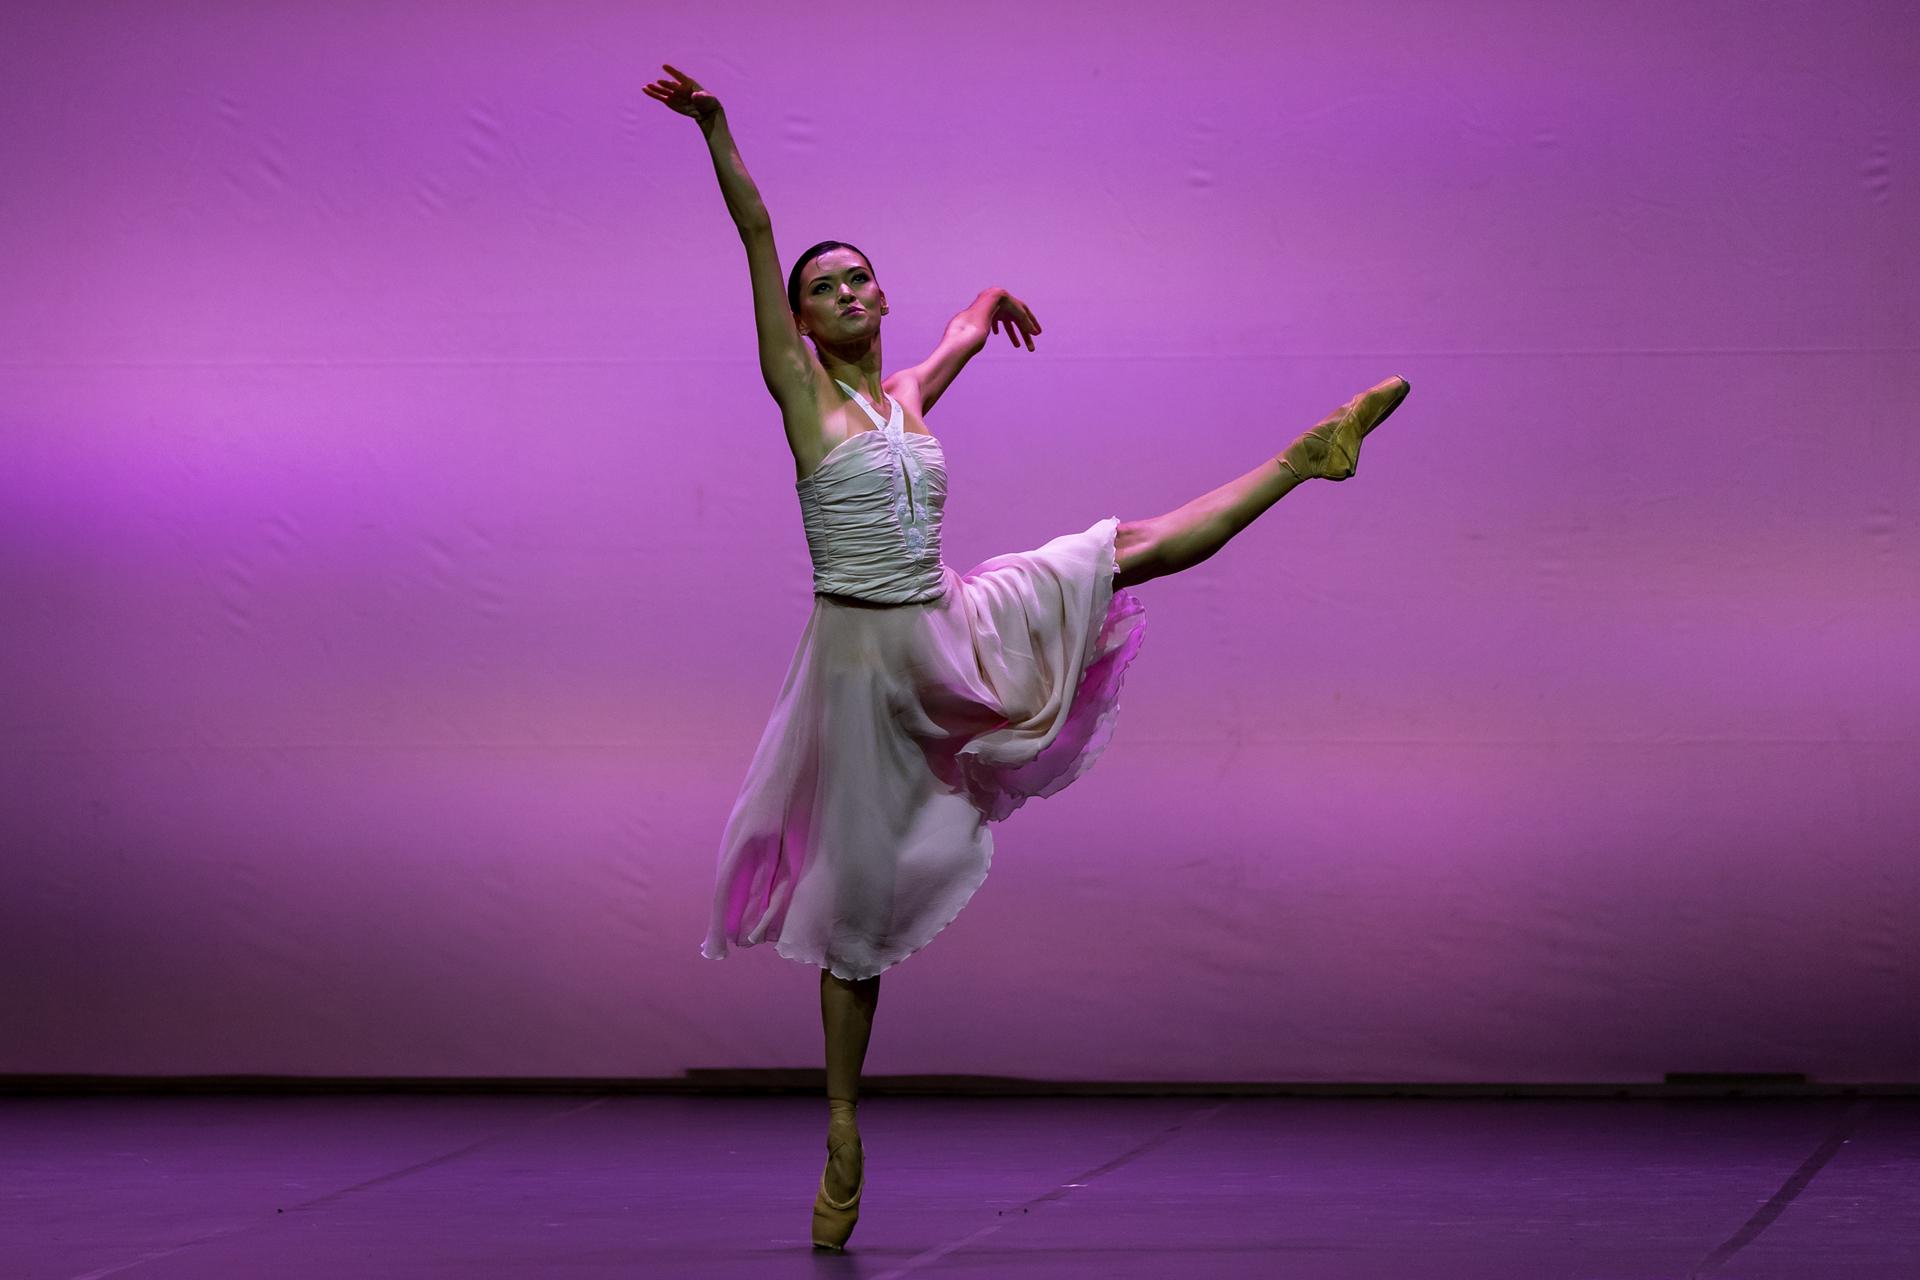 2018_09_09-Astana-Ballet-©LKV-204612-5D4B2060